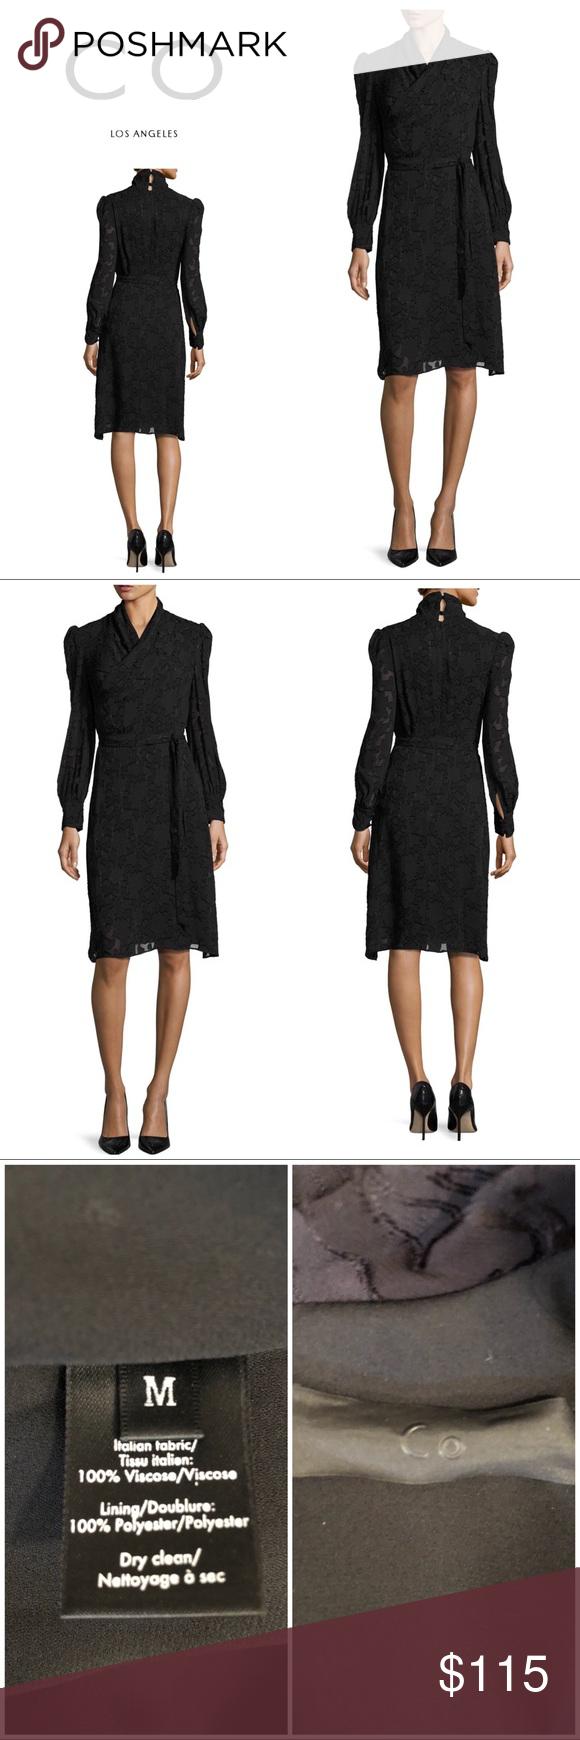 New co los angeles burnout black wrap dress my posh picks